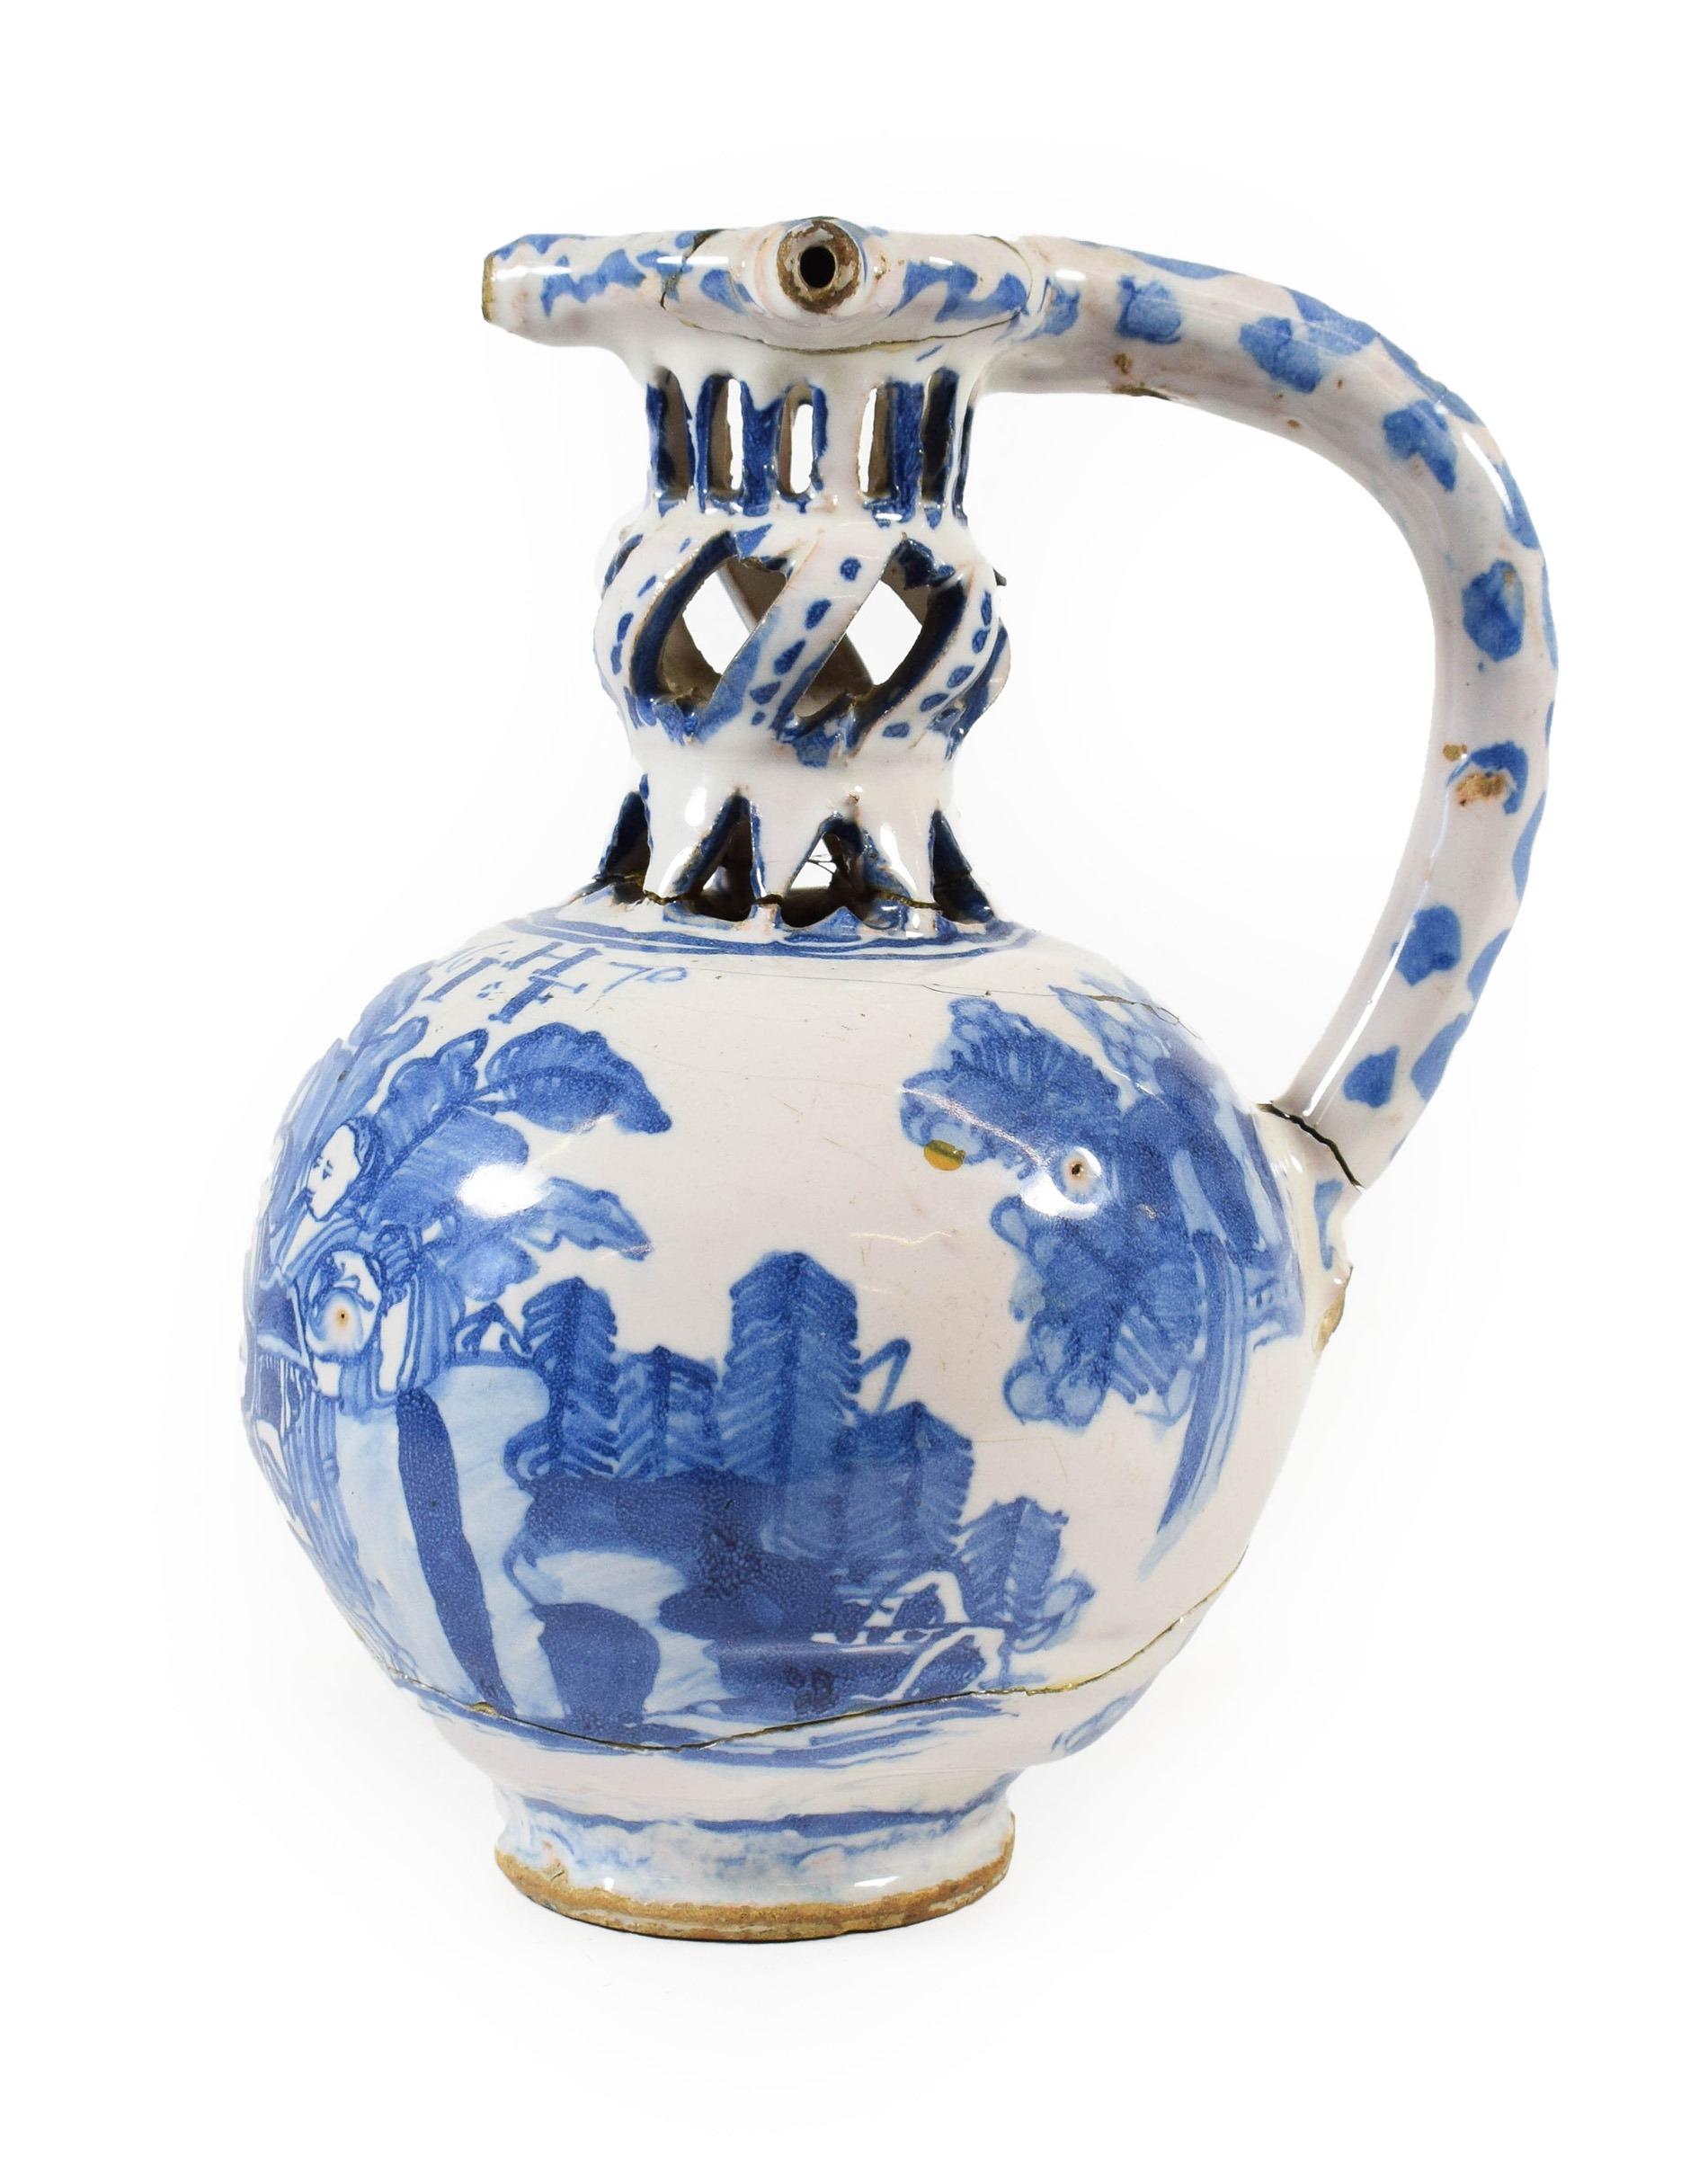 A 17th-century English Delft puzzle jug